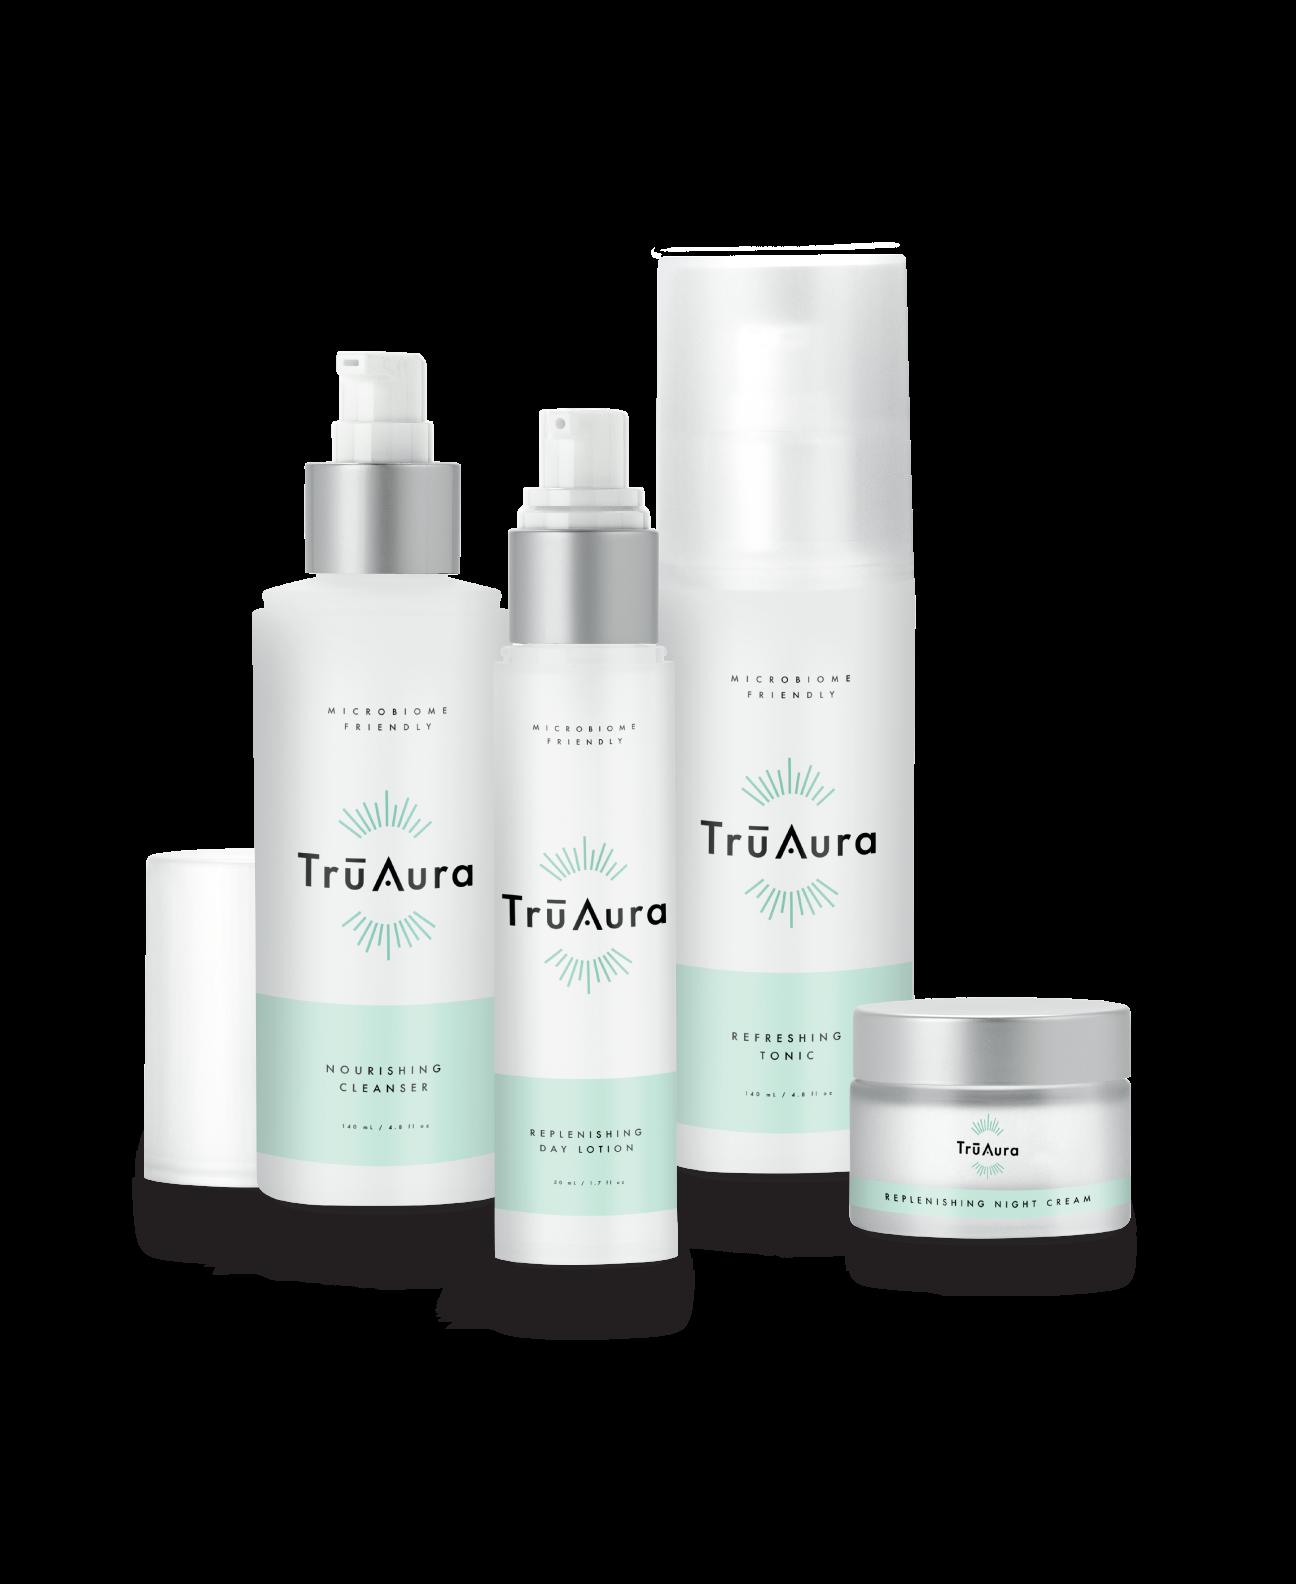 TruArua-Skincare-Comp02.png